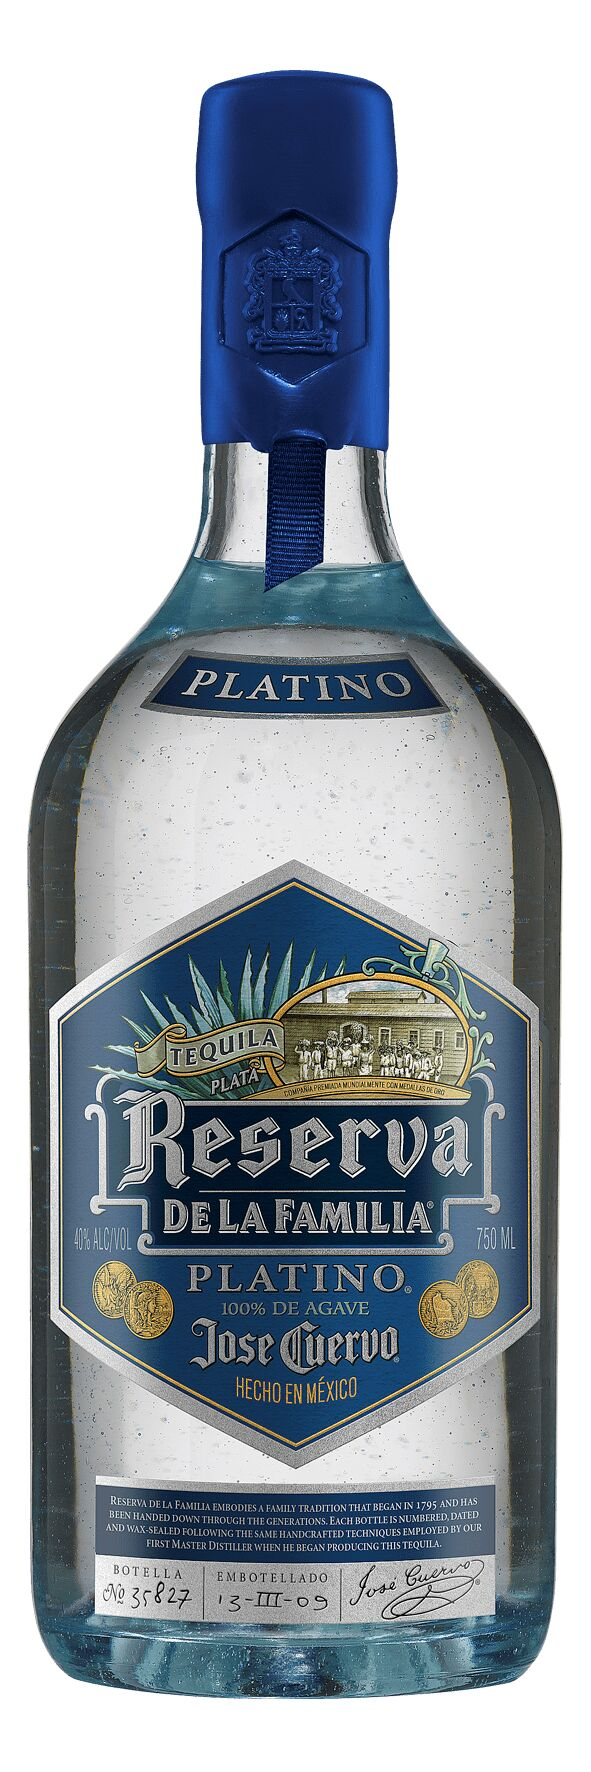 Heritage-Celebrating Tequila